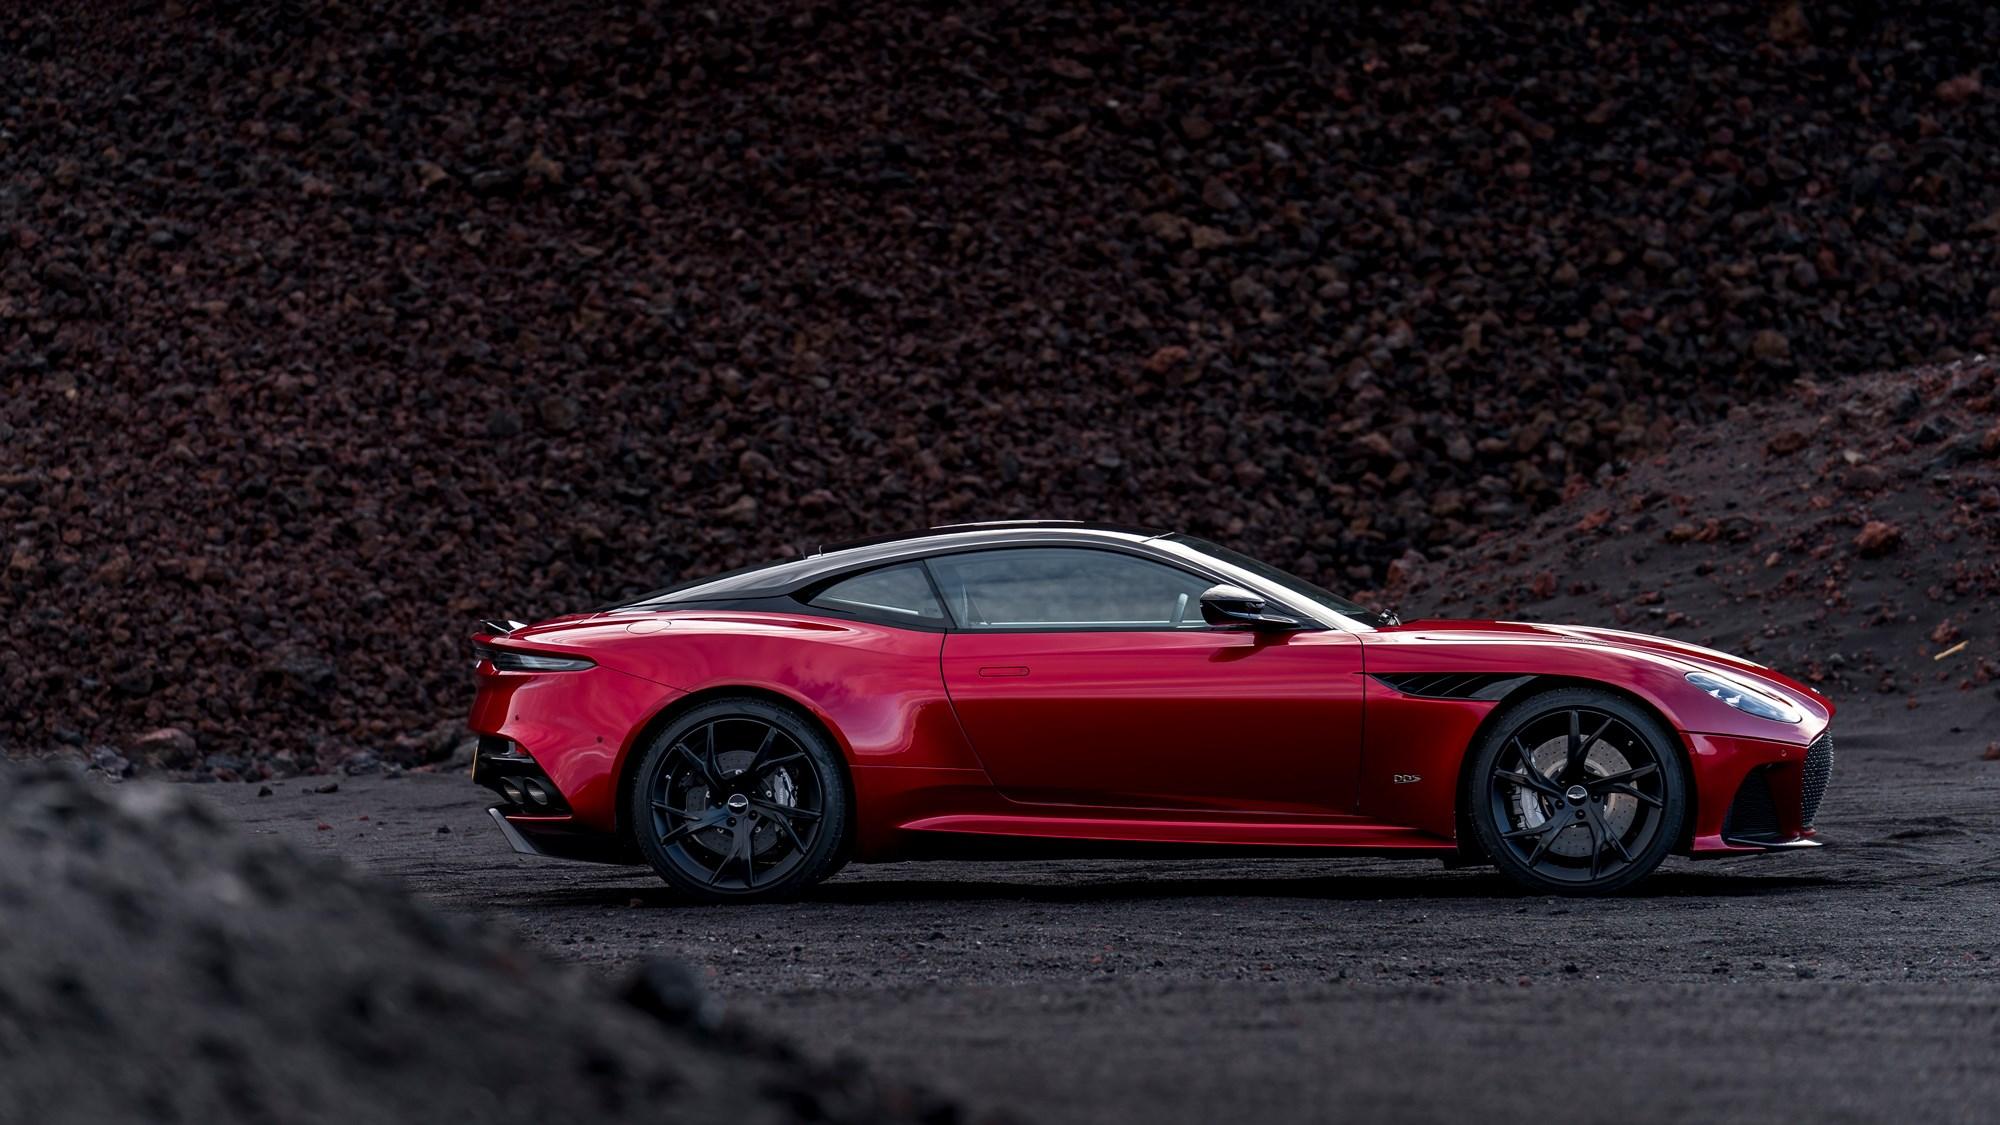 Aston Martin DBS Superleggera Convertible Volante Is On The Way - Aston martin dbs v12